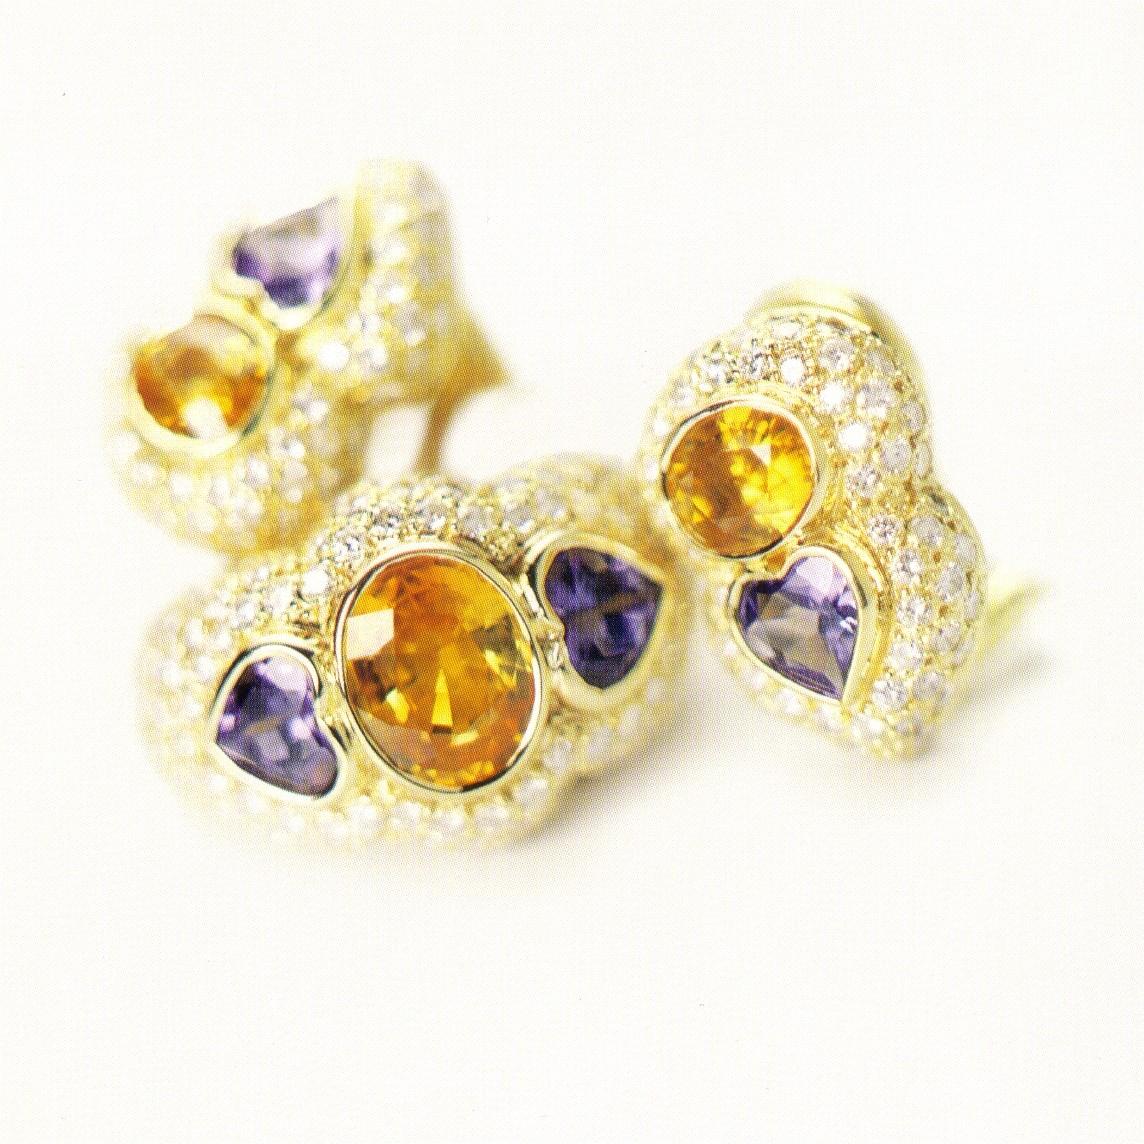 YELLOW SAPPHIRE, TANZANITE & PAVE DIAMOND EARRINGS & RING